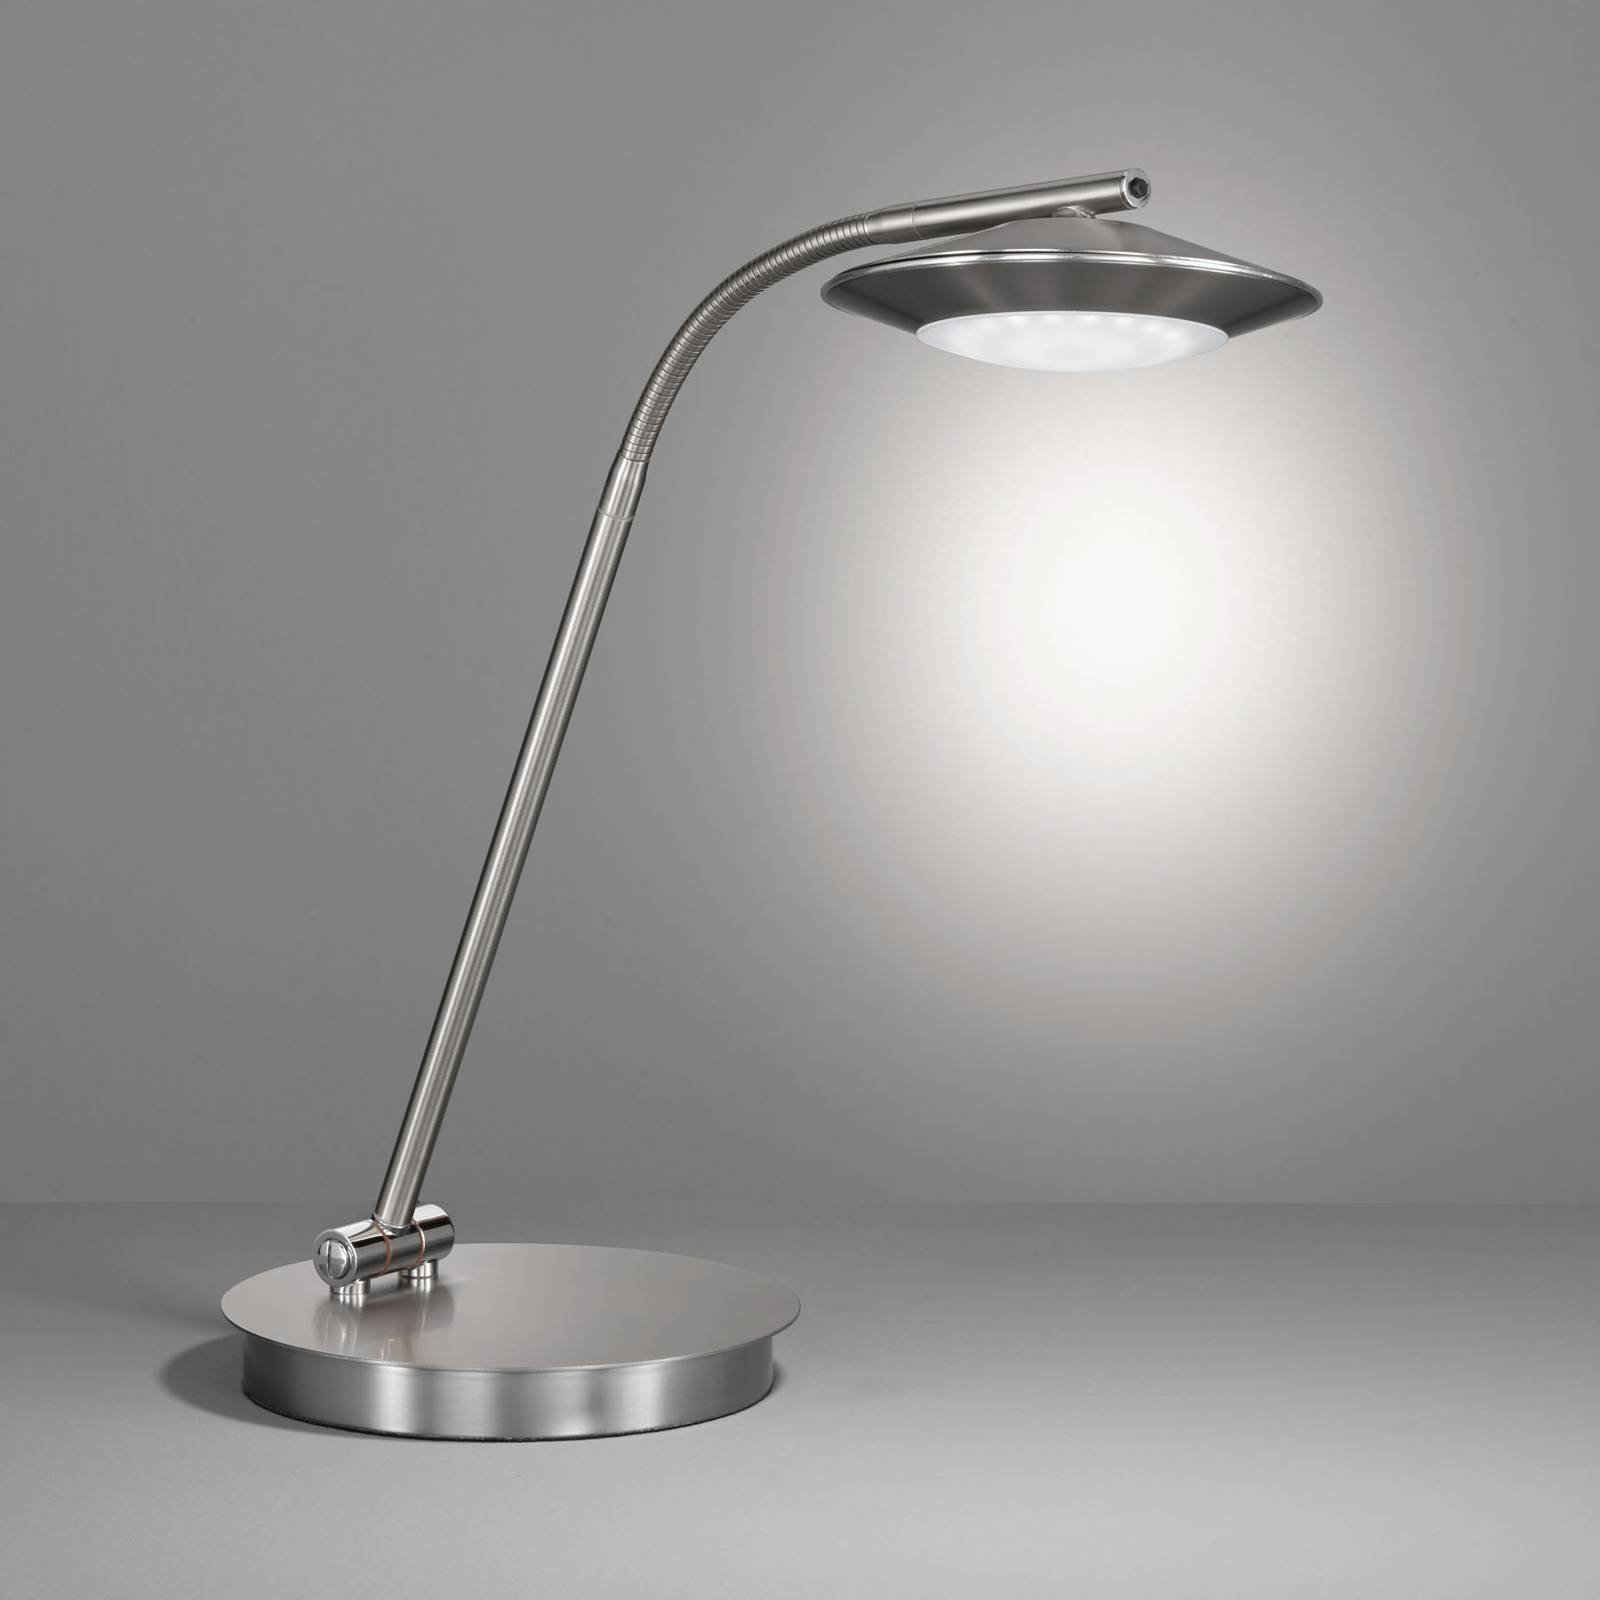 LED-bordlampe Z-Beta ZigBee fjernkontroll touch